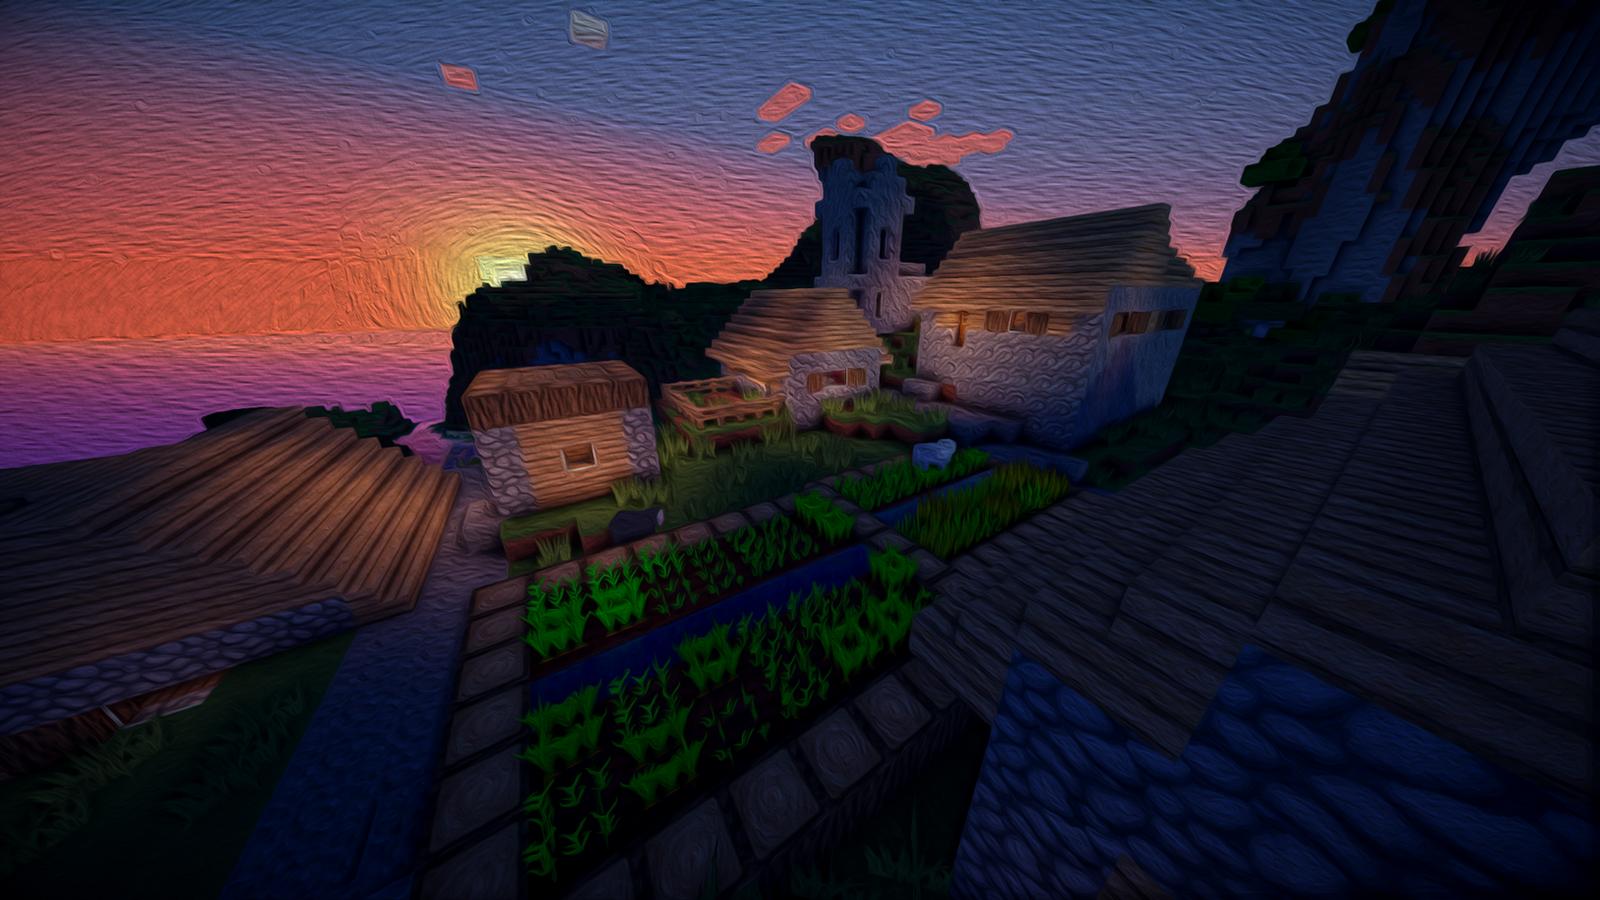 Beautiful Wallpaper Minecraft Night - minecraft_oil_painting__night_village__2__by_stickshift2000-d7yszk3  Trends_548958.png